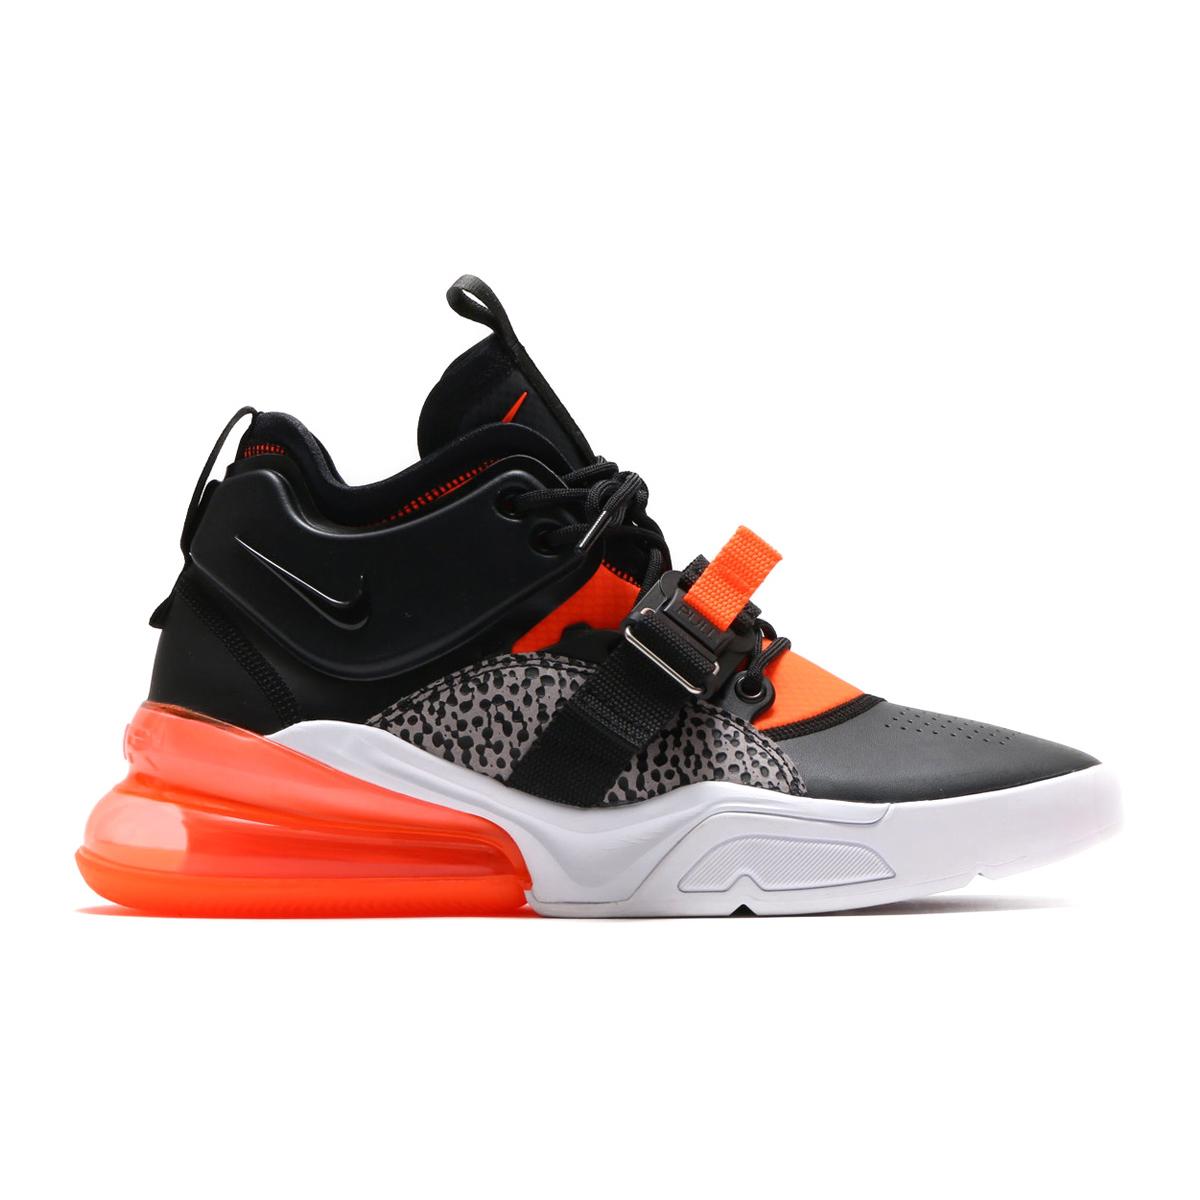 Nike Air Max Thea Impression Coupon Safari